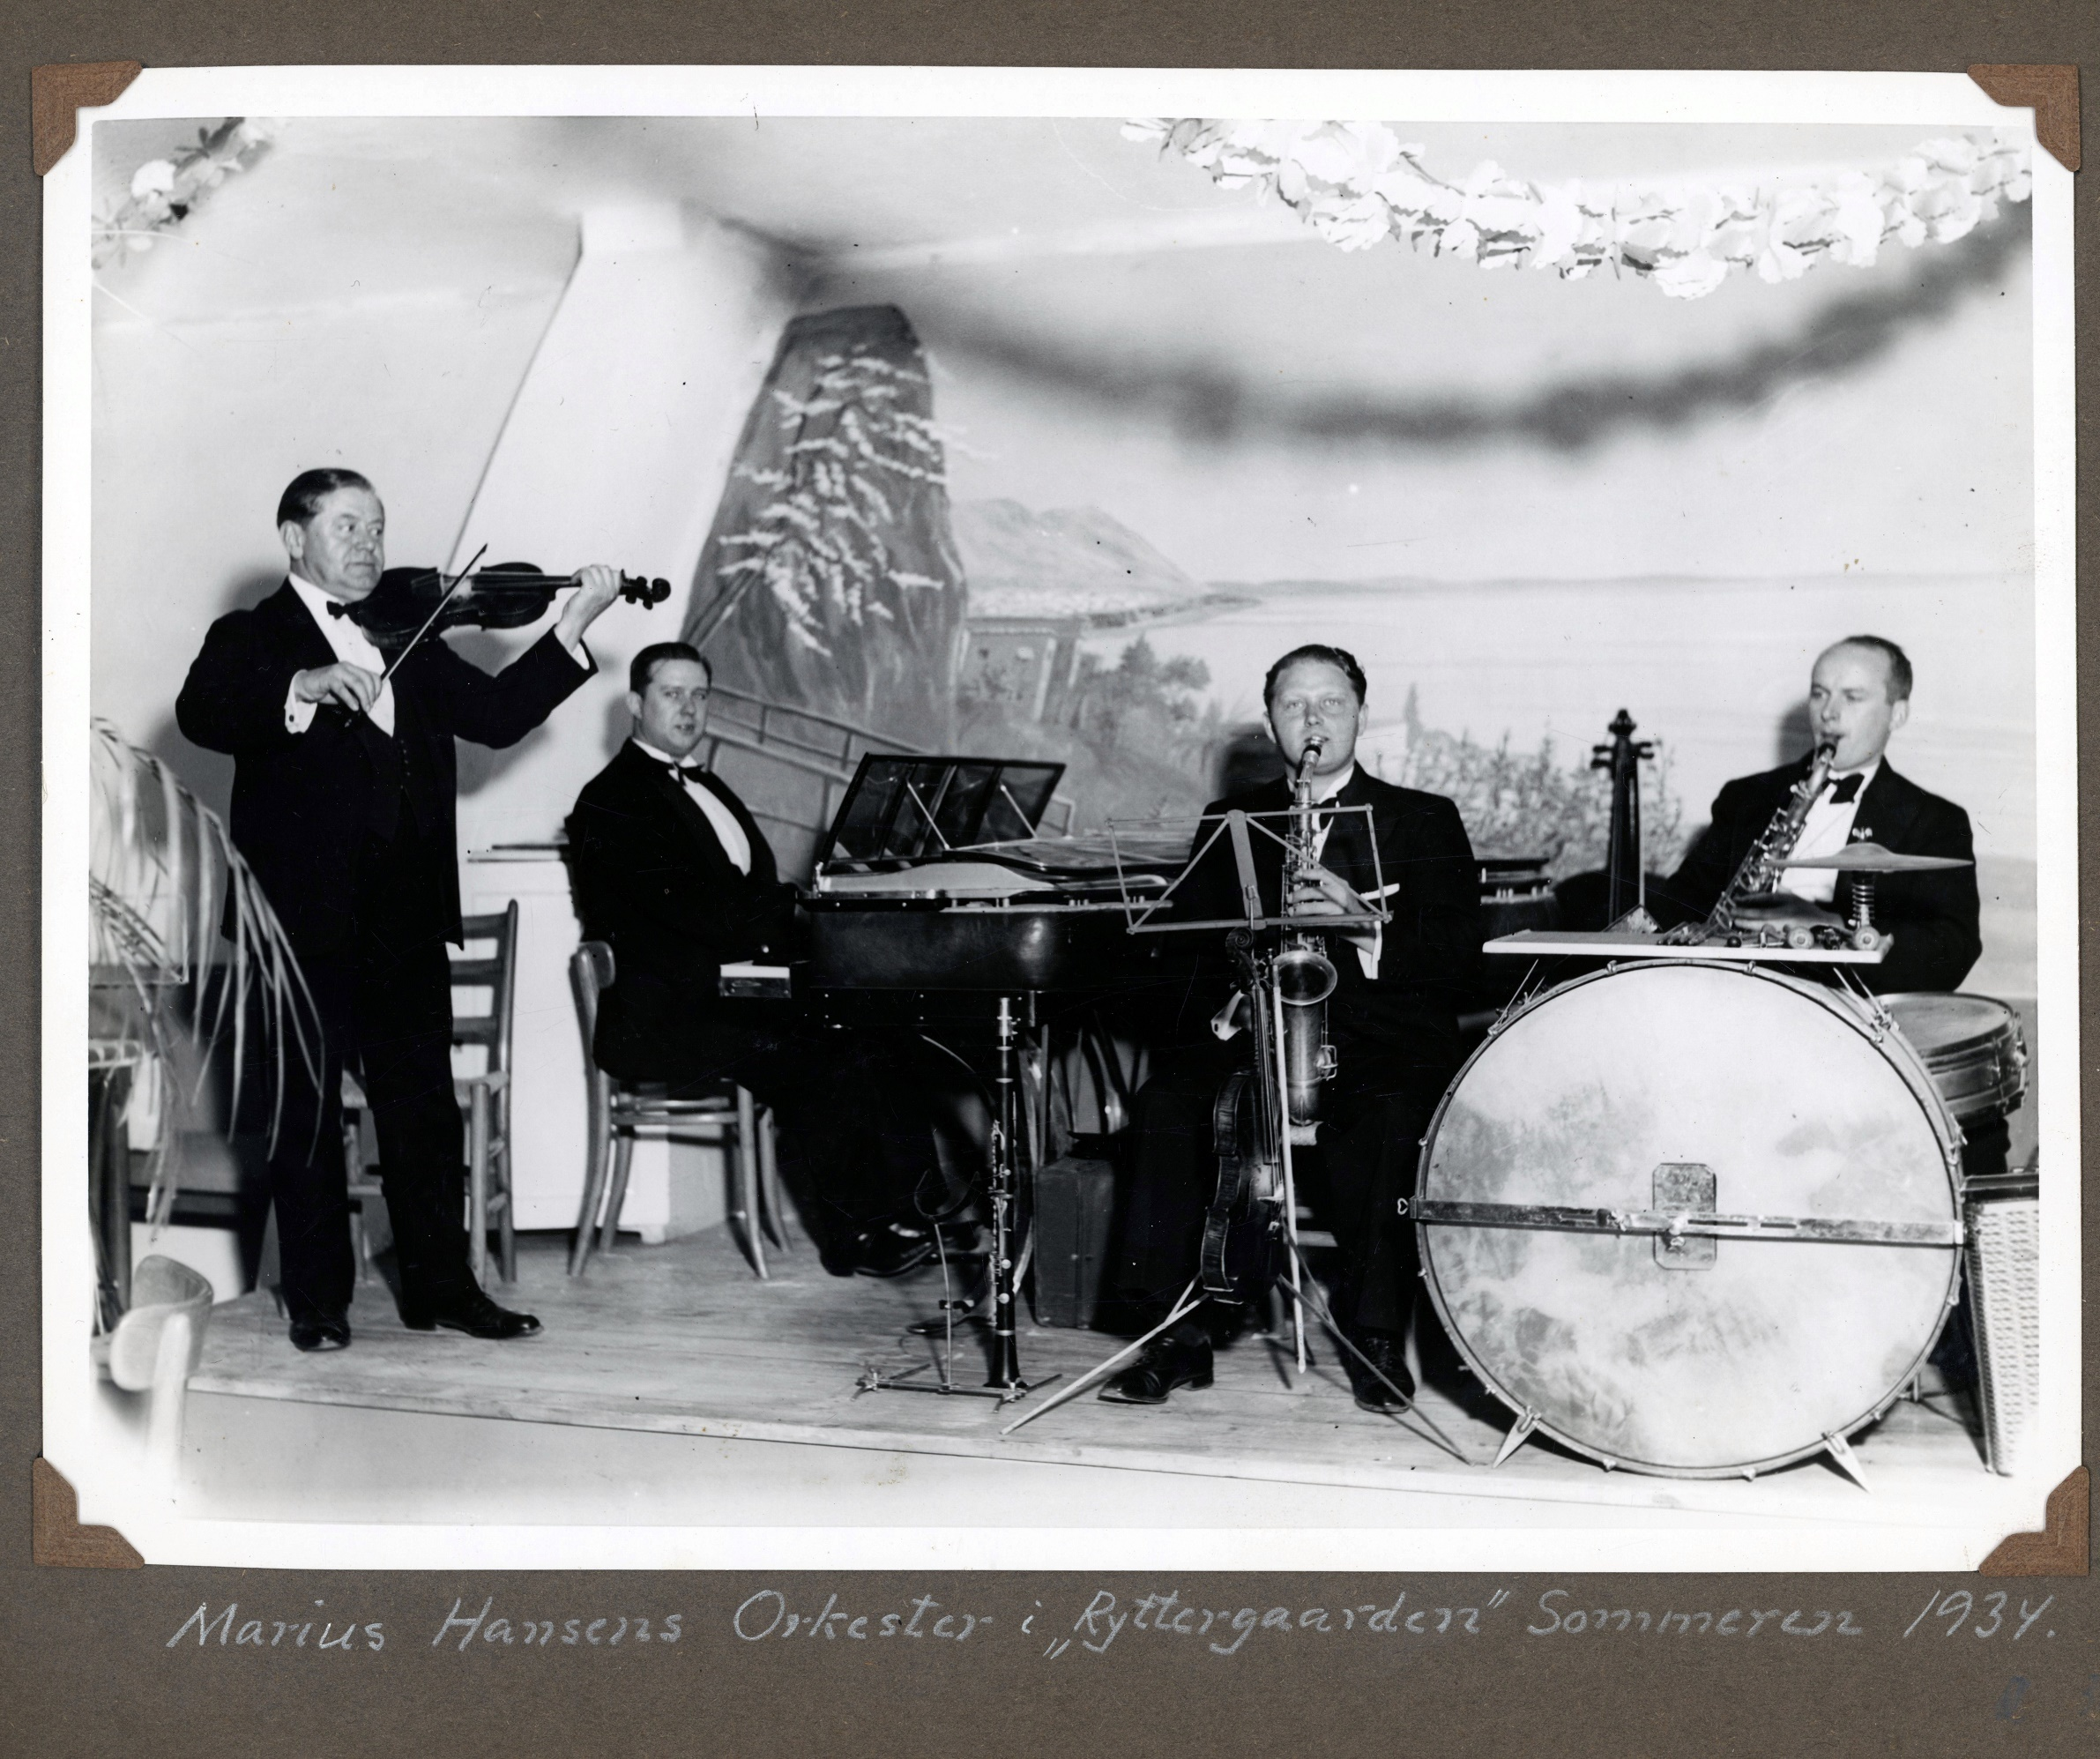 70.303 Marius Hansens Orkester i Ryttergaarden, sommeren 1934.